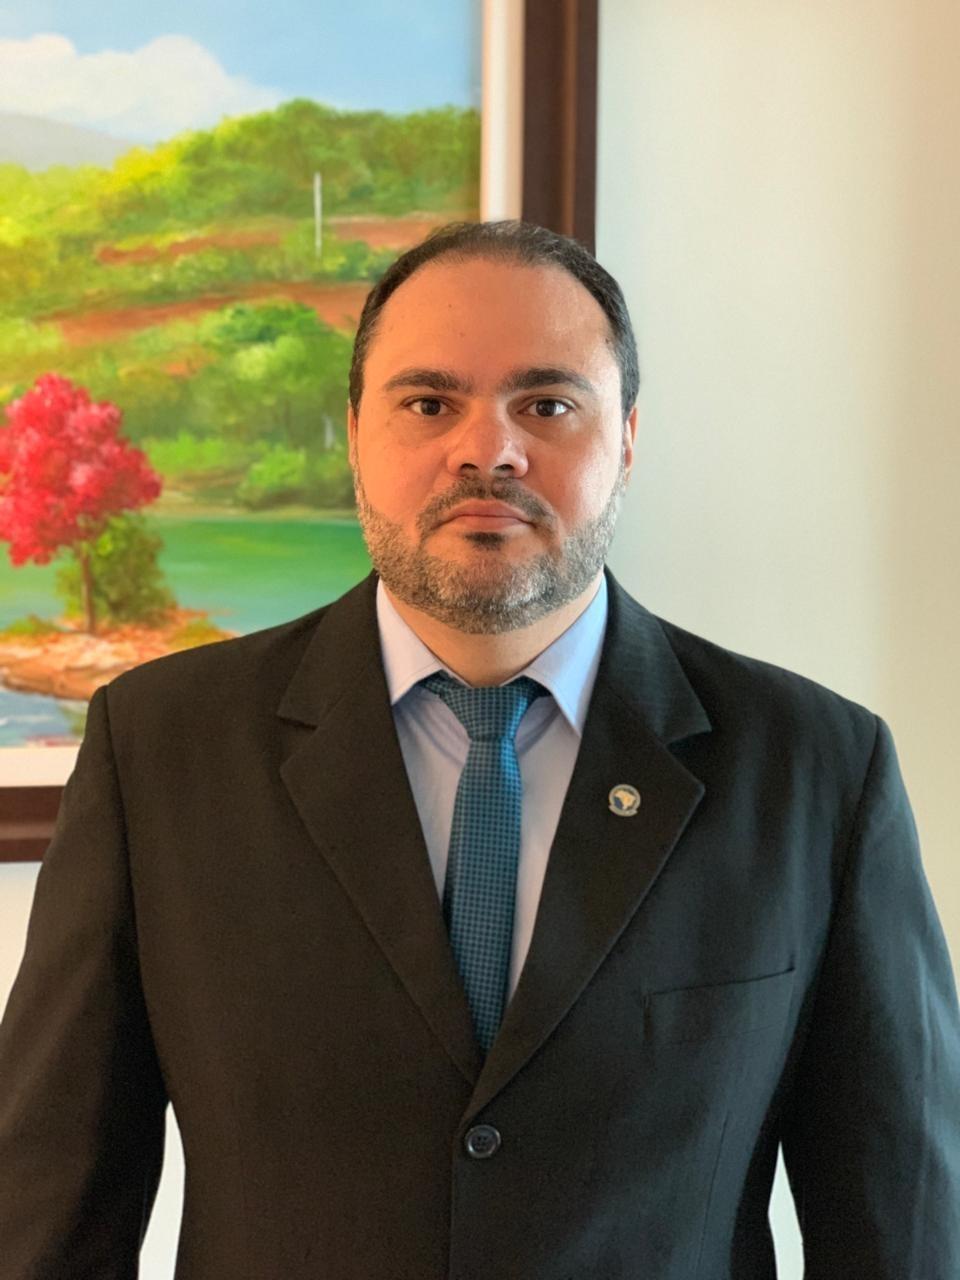 Samuel de Souza Brito Oliveira